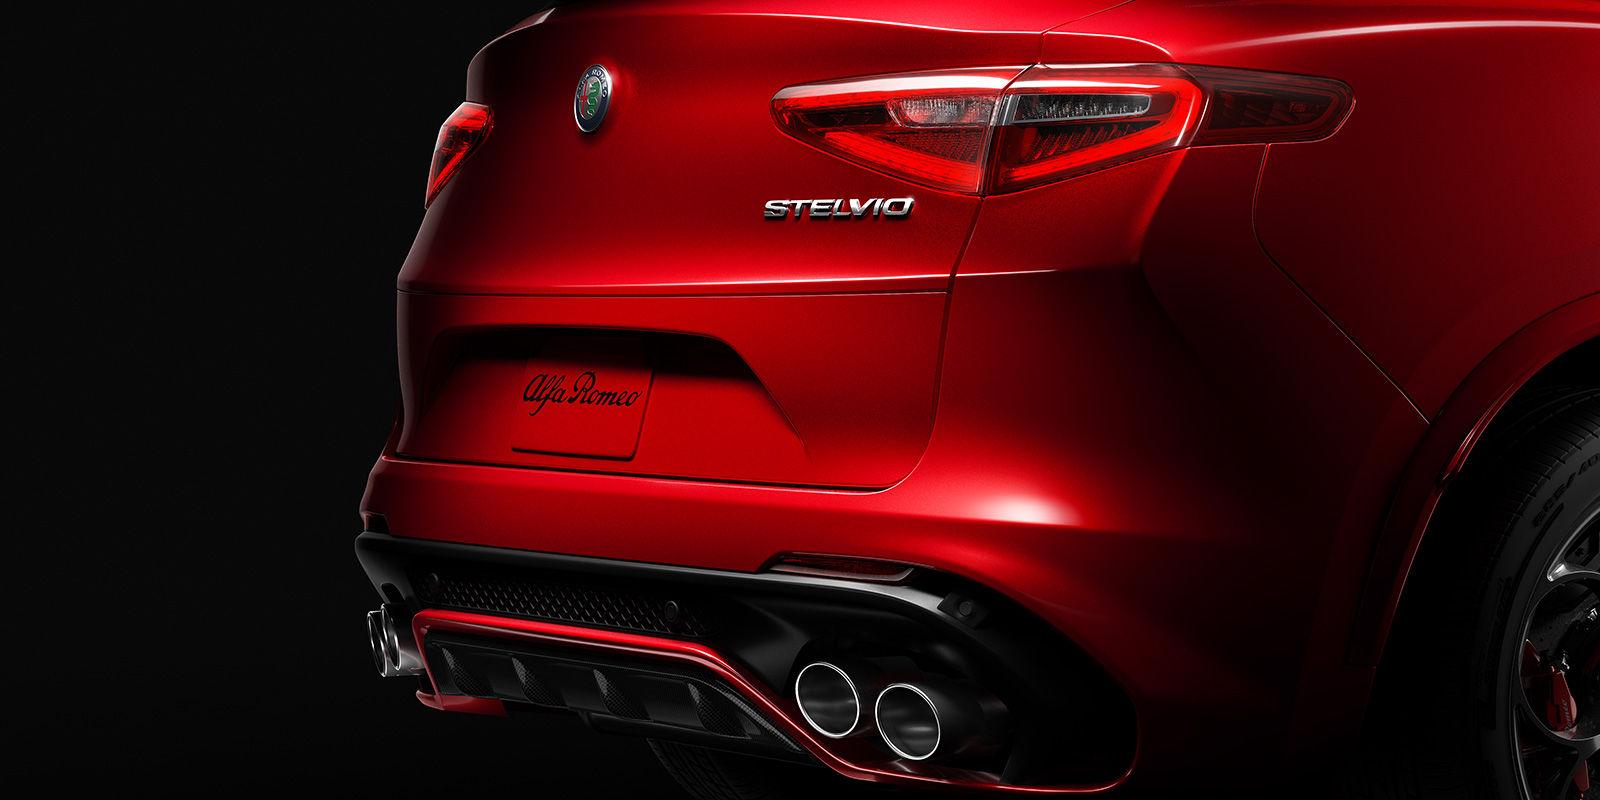 Alfa Romeo Stelvio And Stelvio Quadrifoglio For Sale